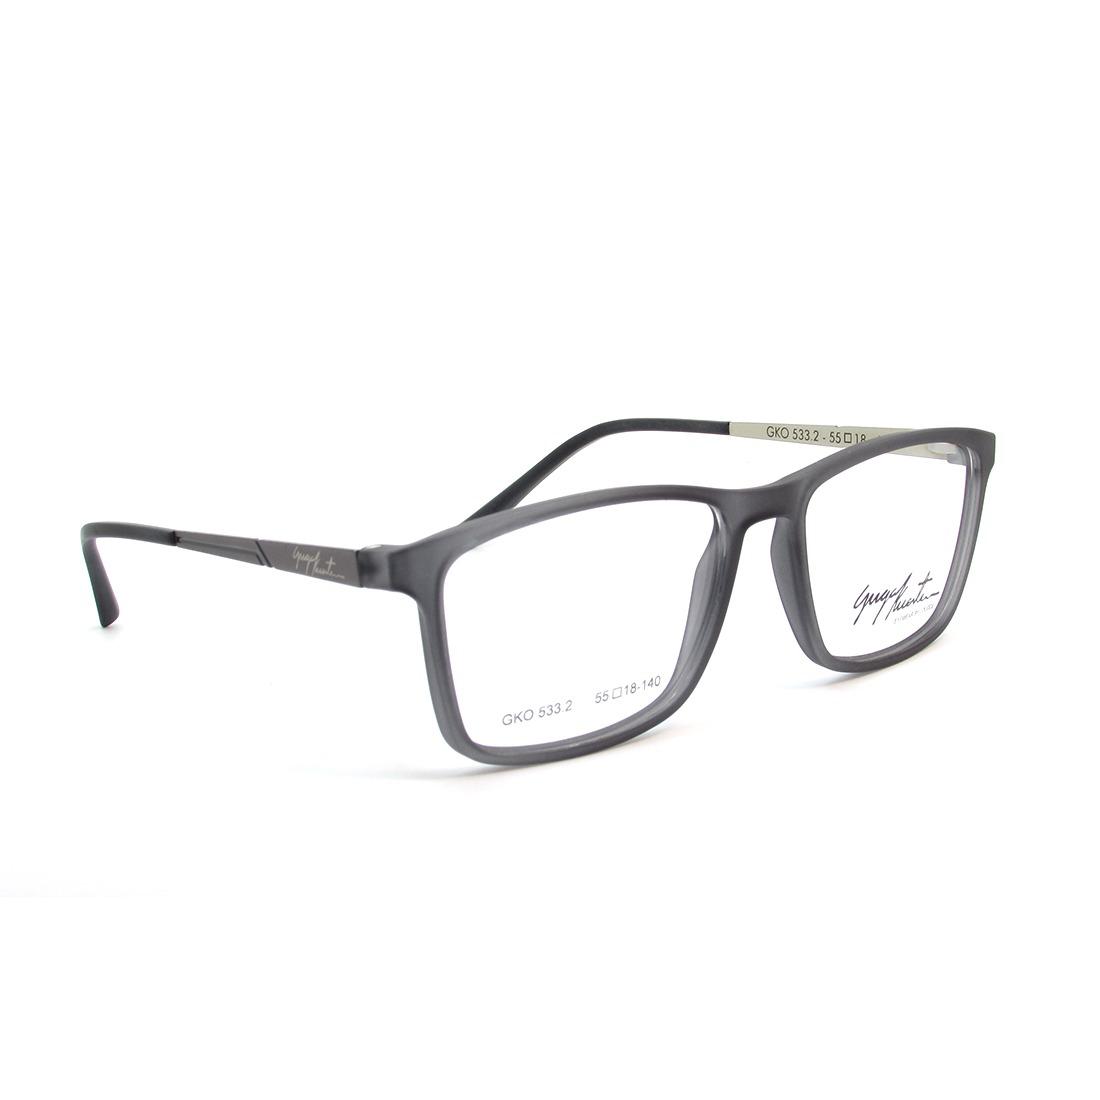 fc87a9bd9cde6 guga kuerten gko 533 óculos de grau. Carregando zoom.